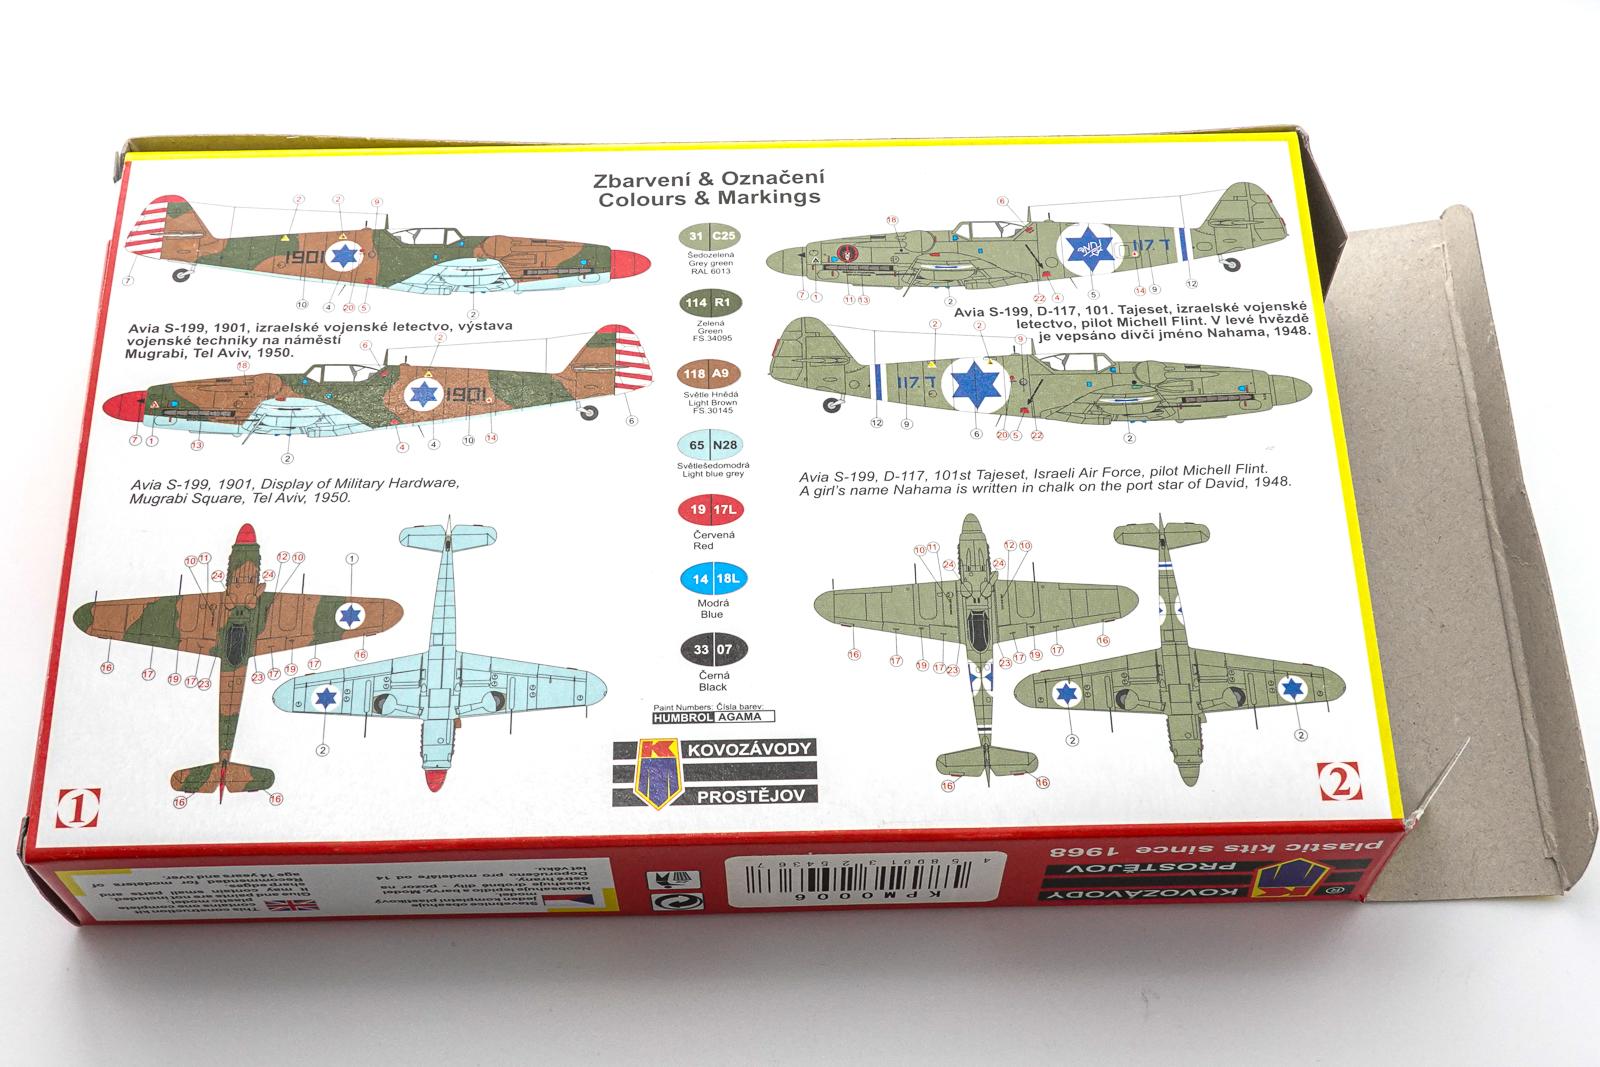 KPモデル 1/72 Avia S-199 プラモデル 箱裏